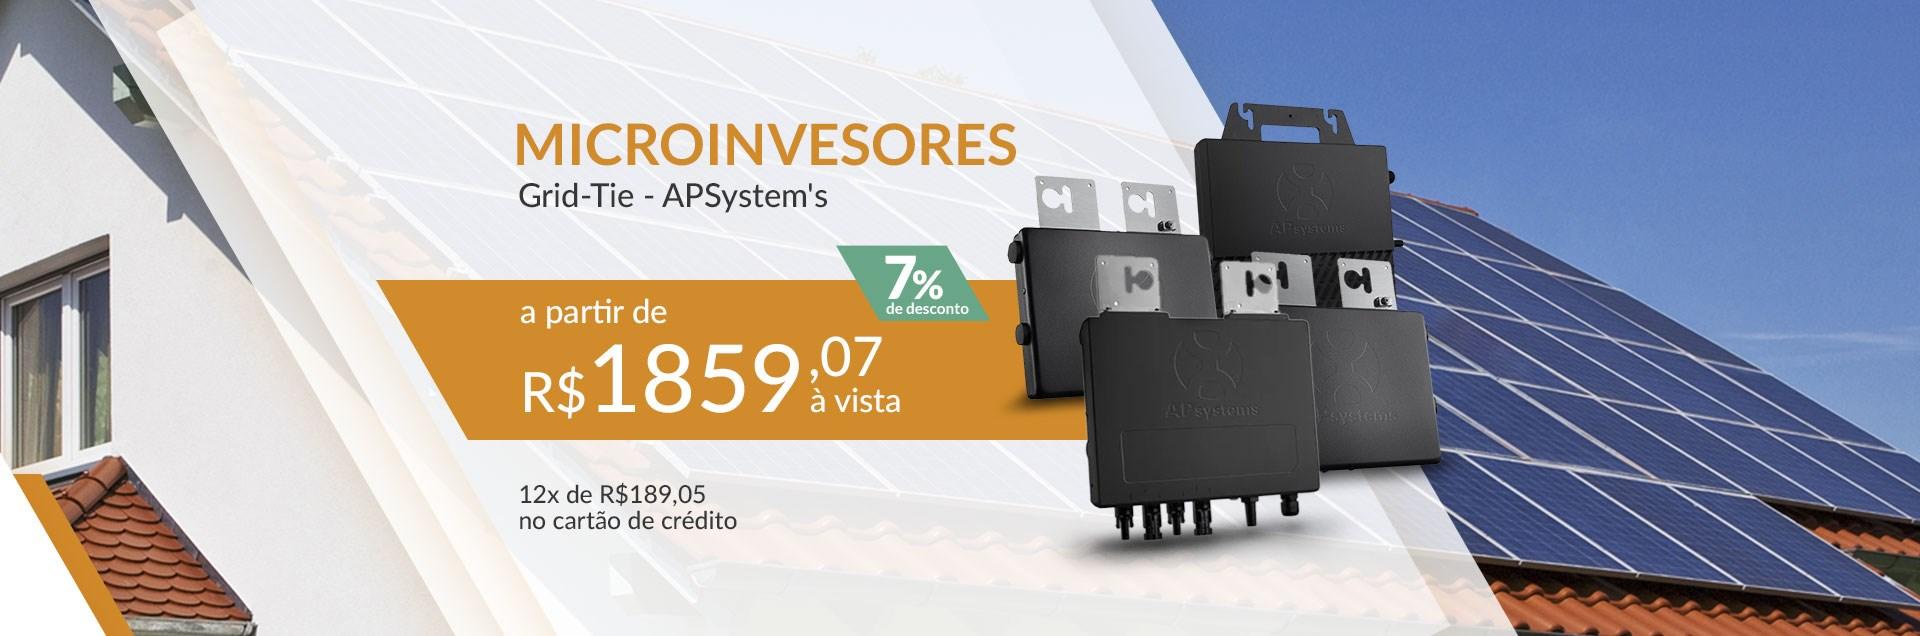 Microinvesores APSystem's